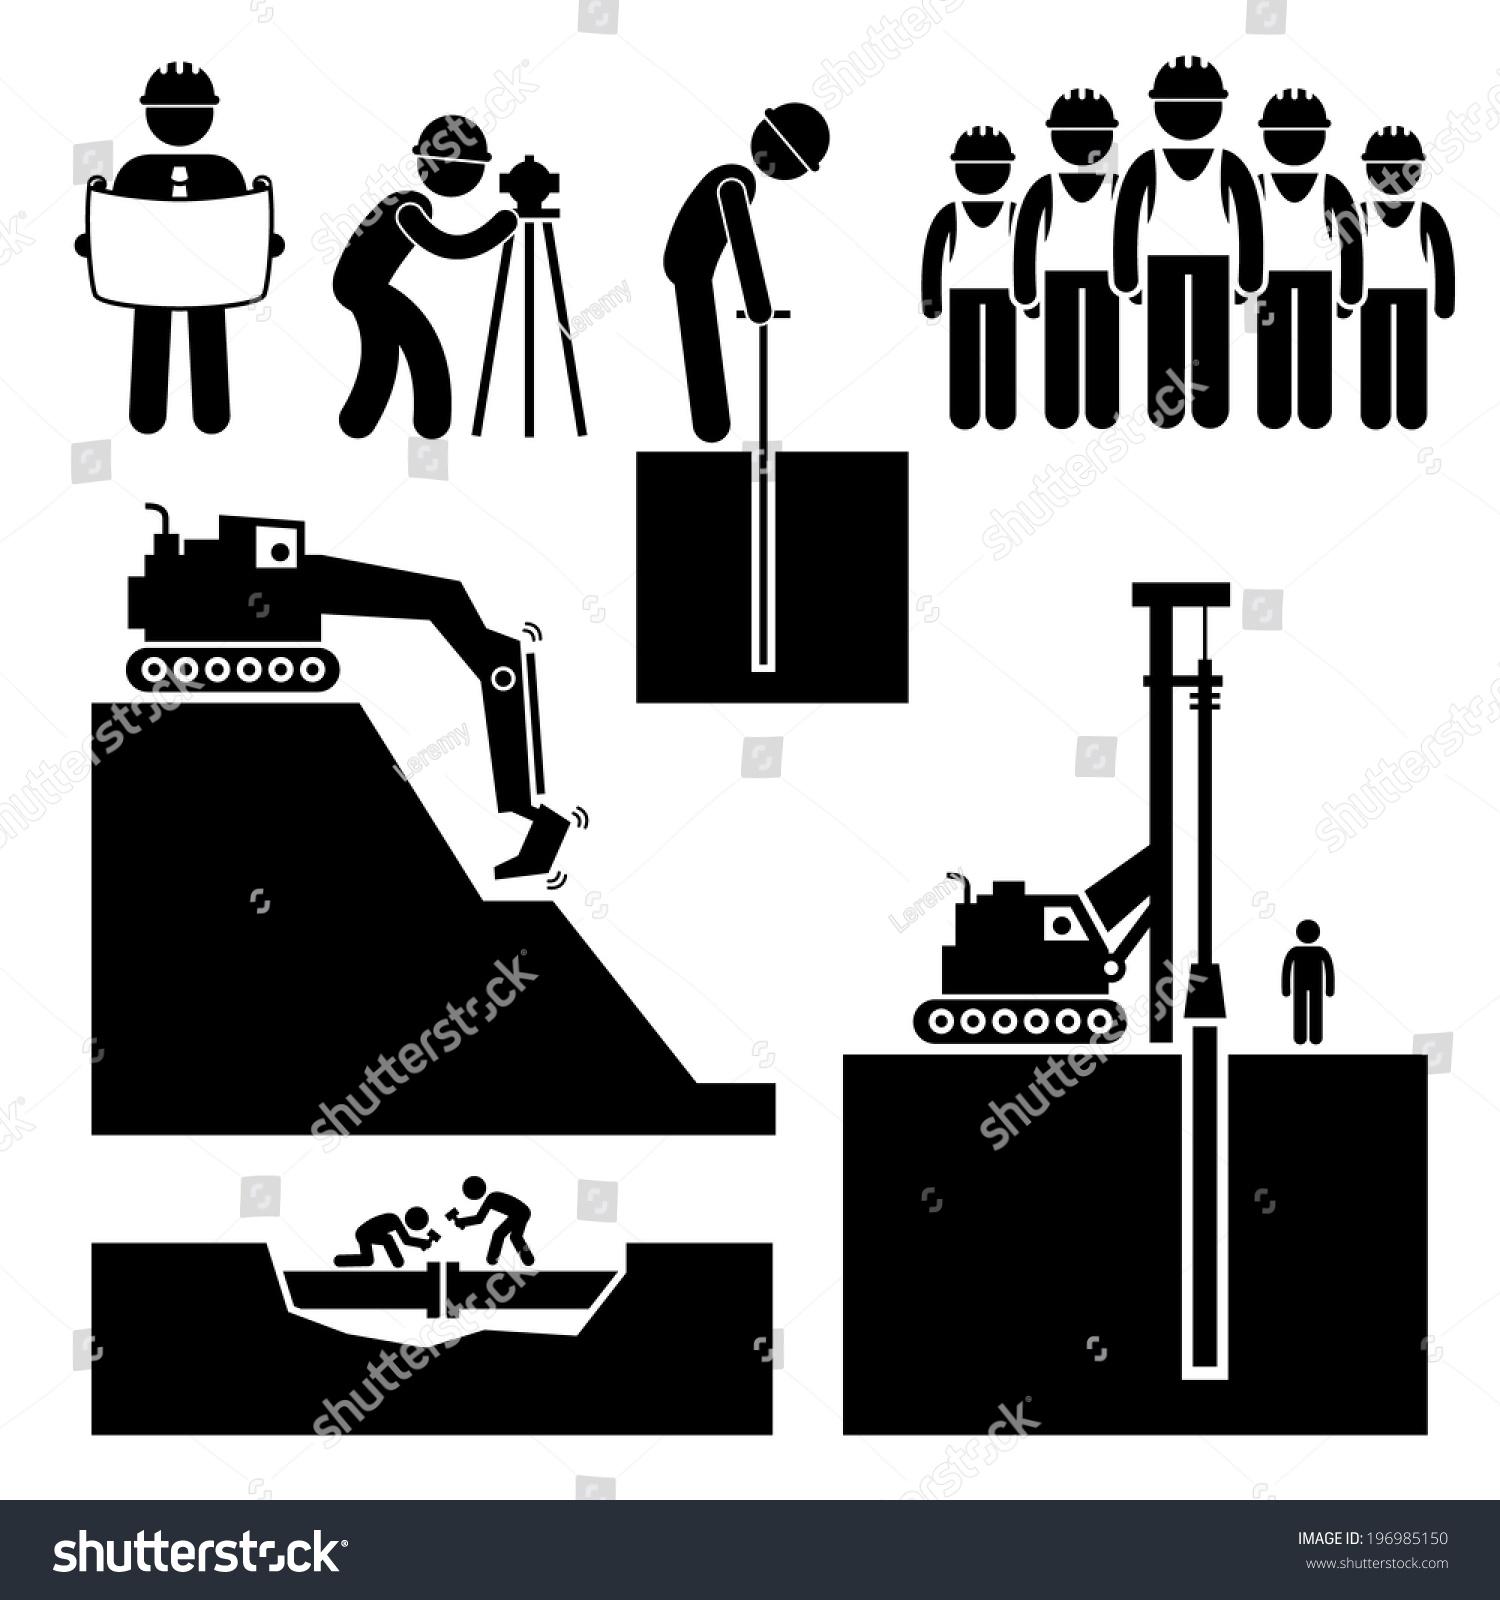 Construction Civil Engineering Earthworks Worker Stick Stock Vector